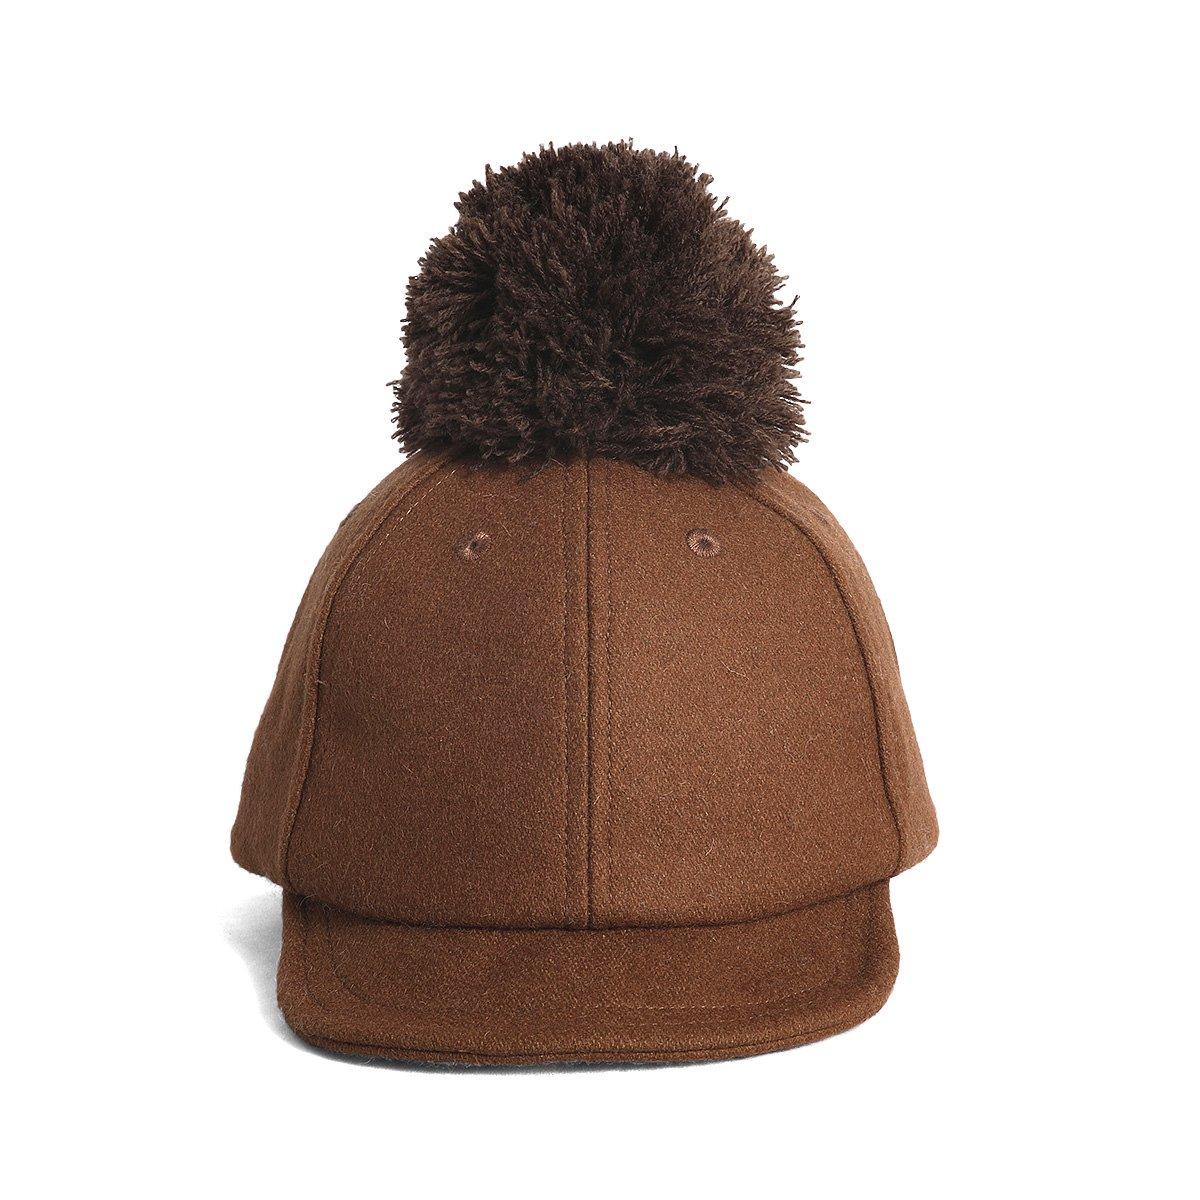 【KIDS】Wool Pom Cap 2 詳細画像3